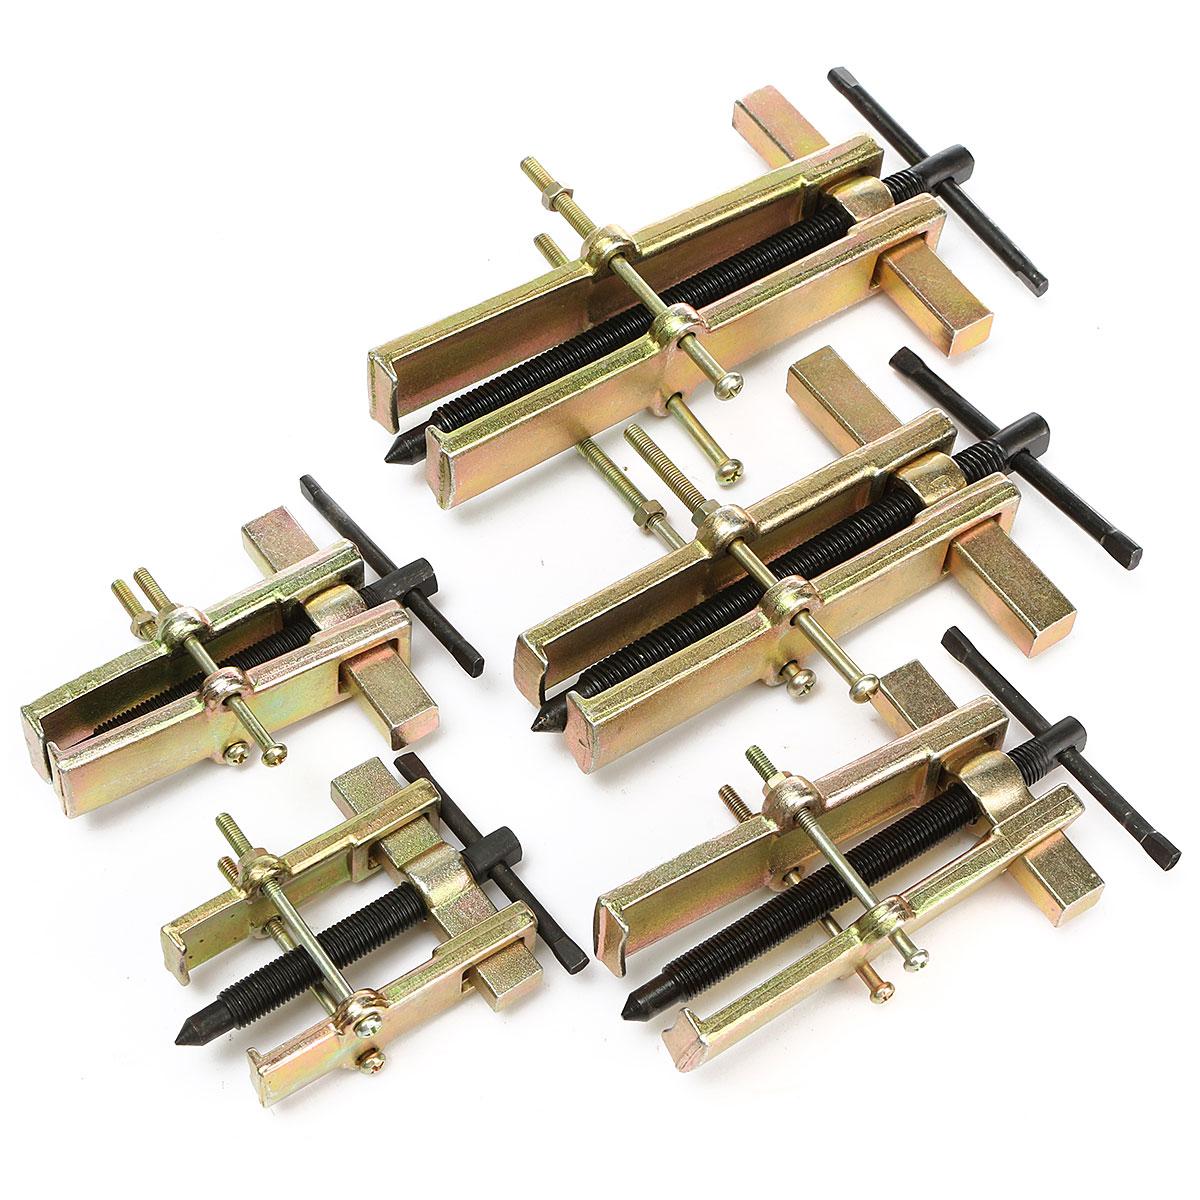 Spiral Puller Steel Two Jaws Gear Puller Armature Bearing Spiral Puller Forging Hexagonal Set Screw Car Home Use